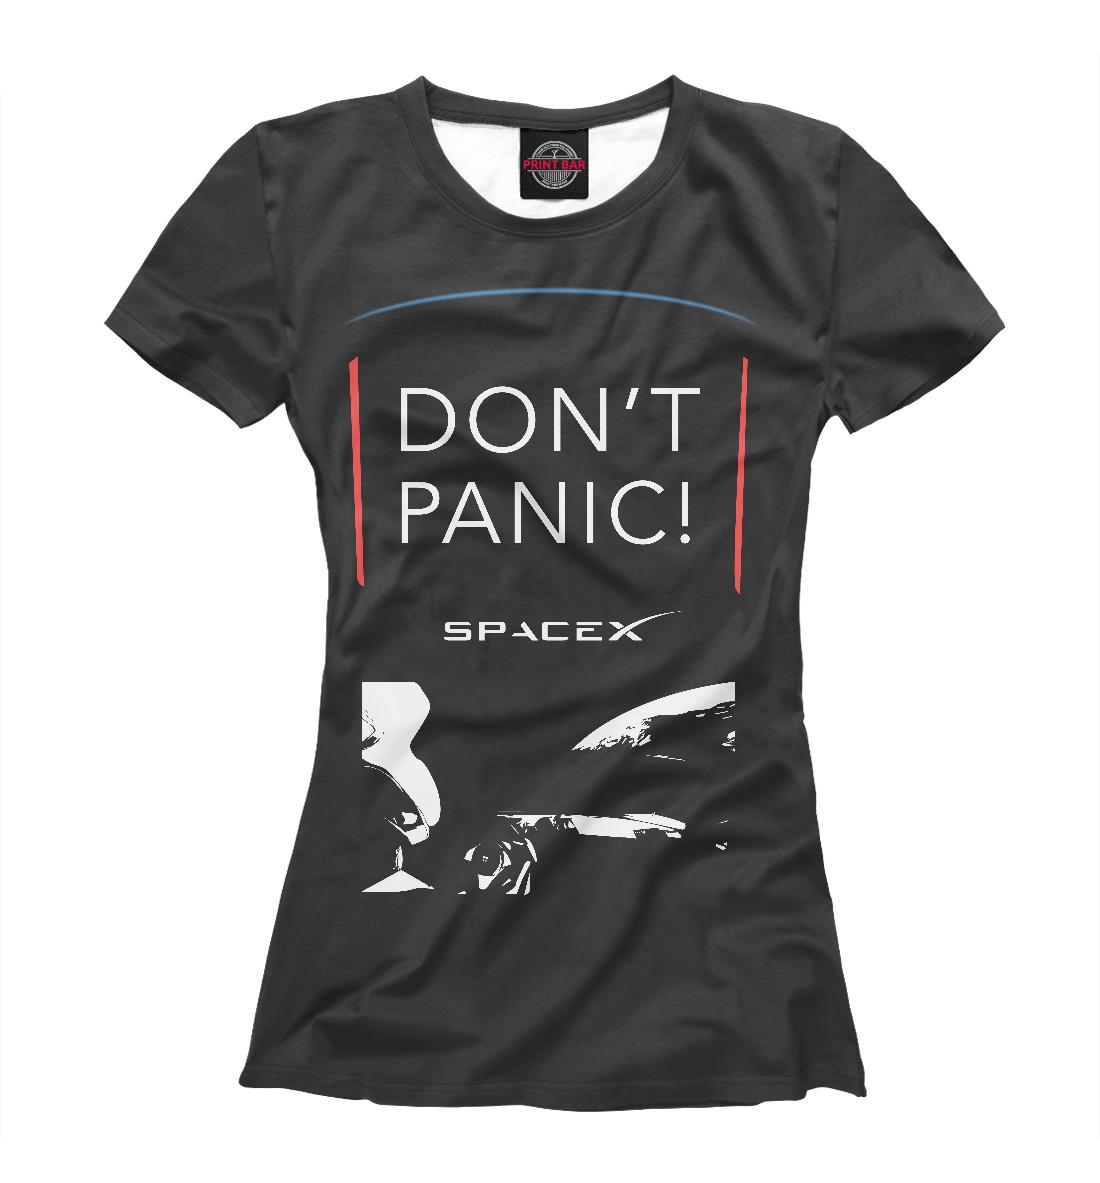 Купить Tesla Starman Don't Panic, Printbar, Футболки, TSA-240375-fut-1